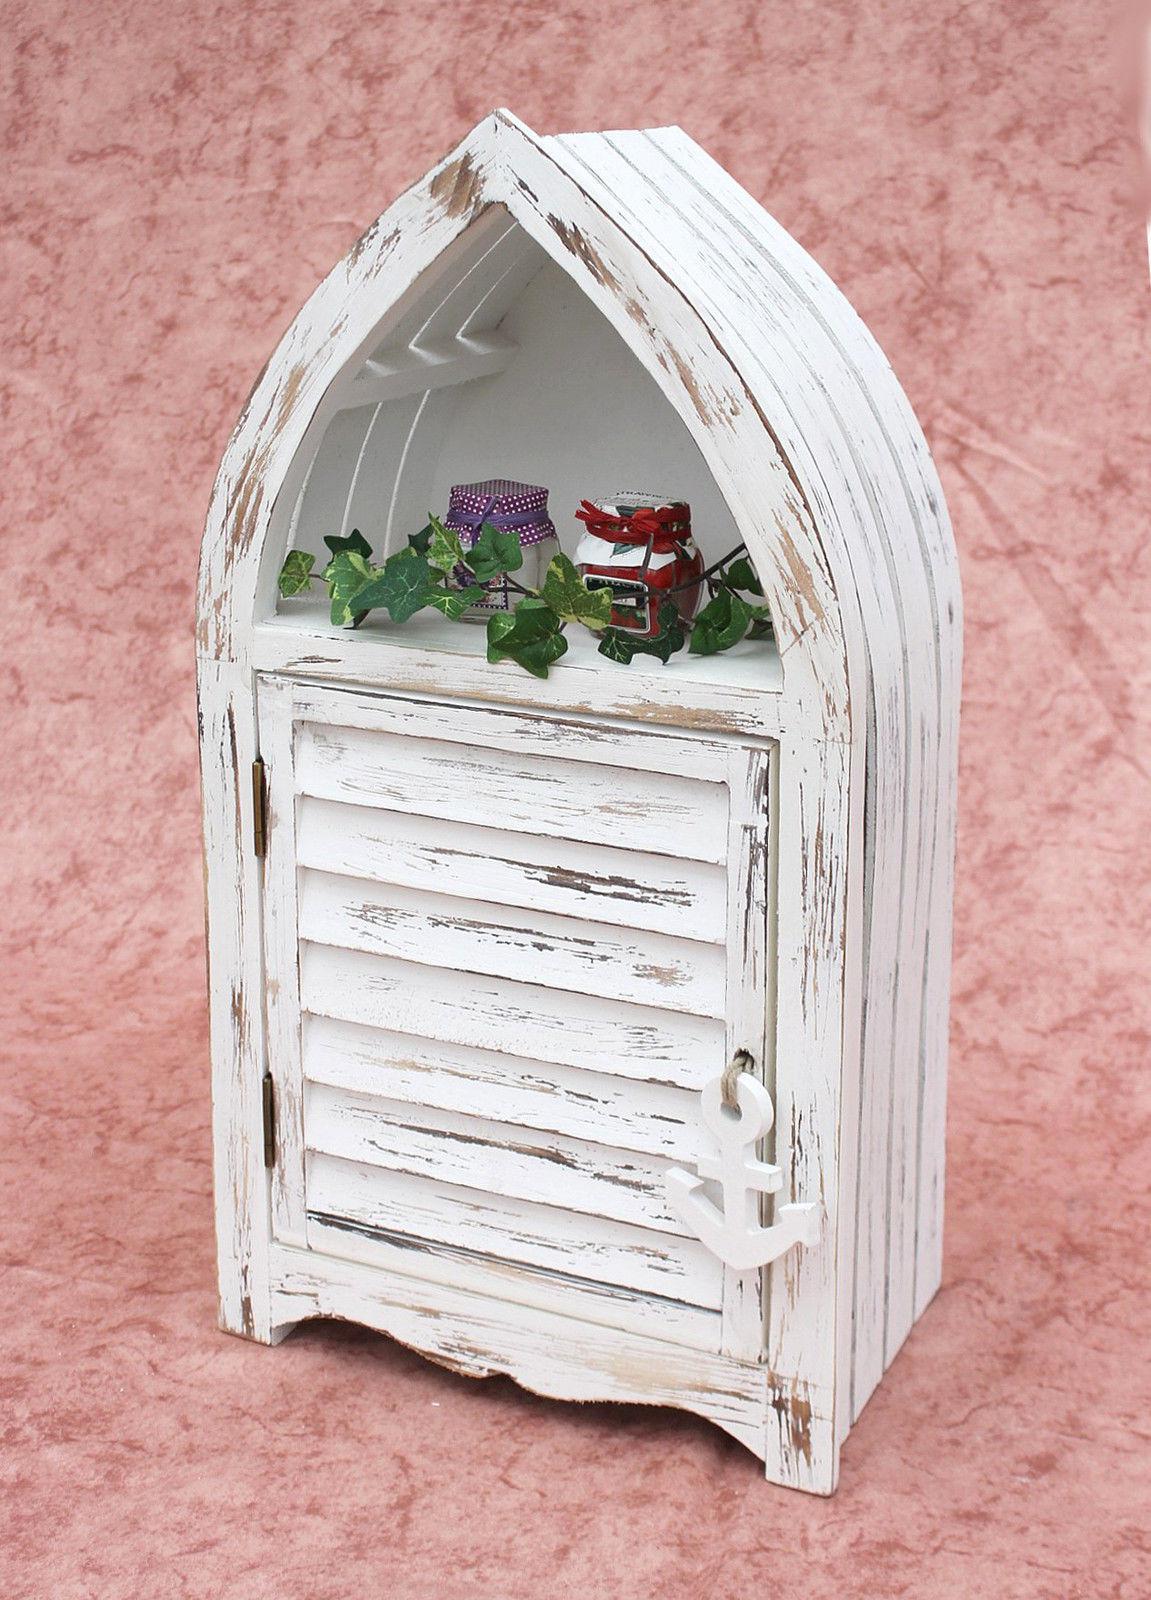 boot schrank 1200011 s regal 60cm badregal shabby badschrank wei badm bel ebay. Black Bedroom Furniture Sets. Home Design Ideas